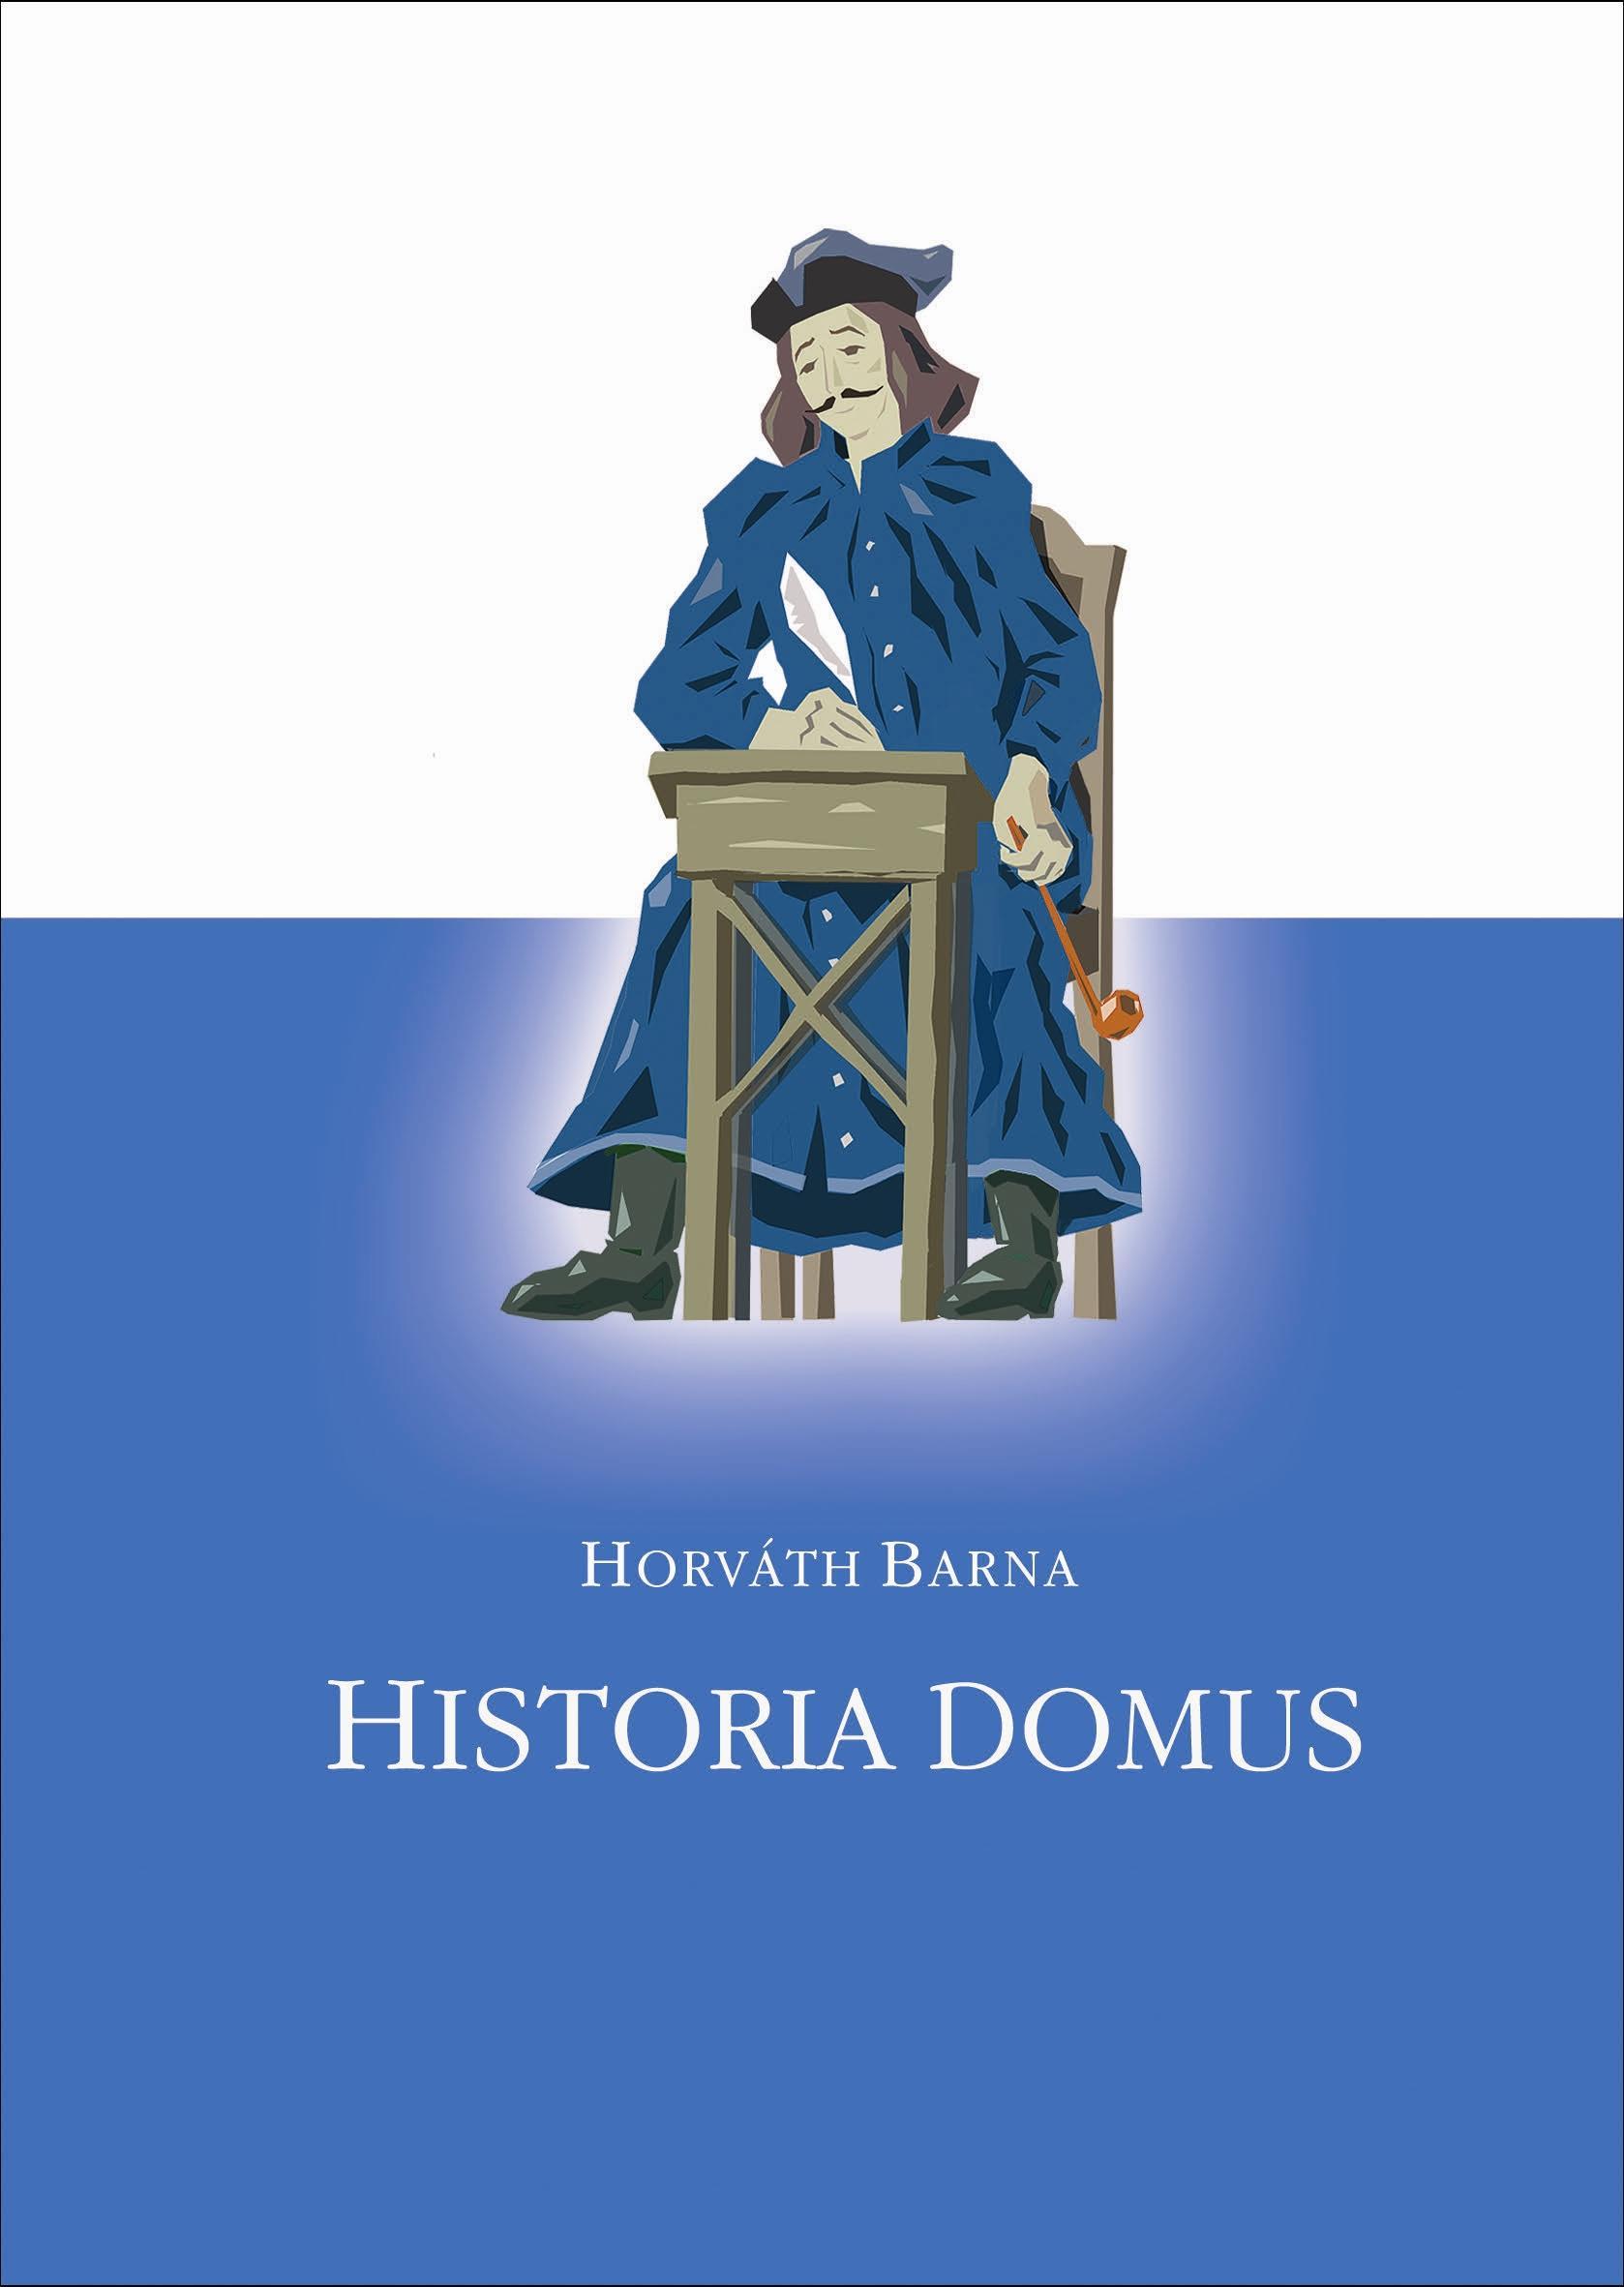 HISTORIA DOMUS